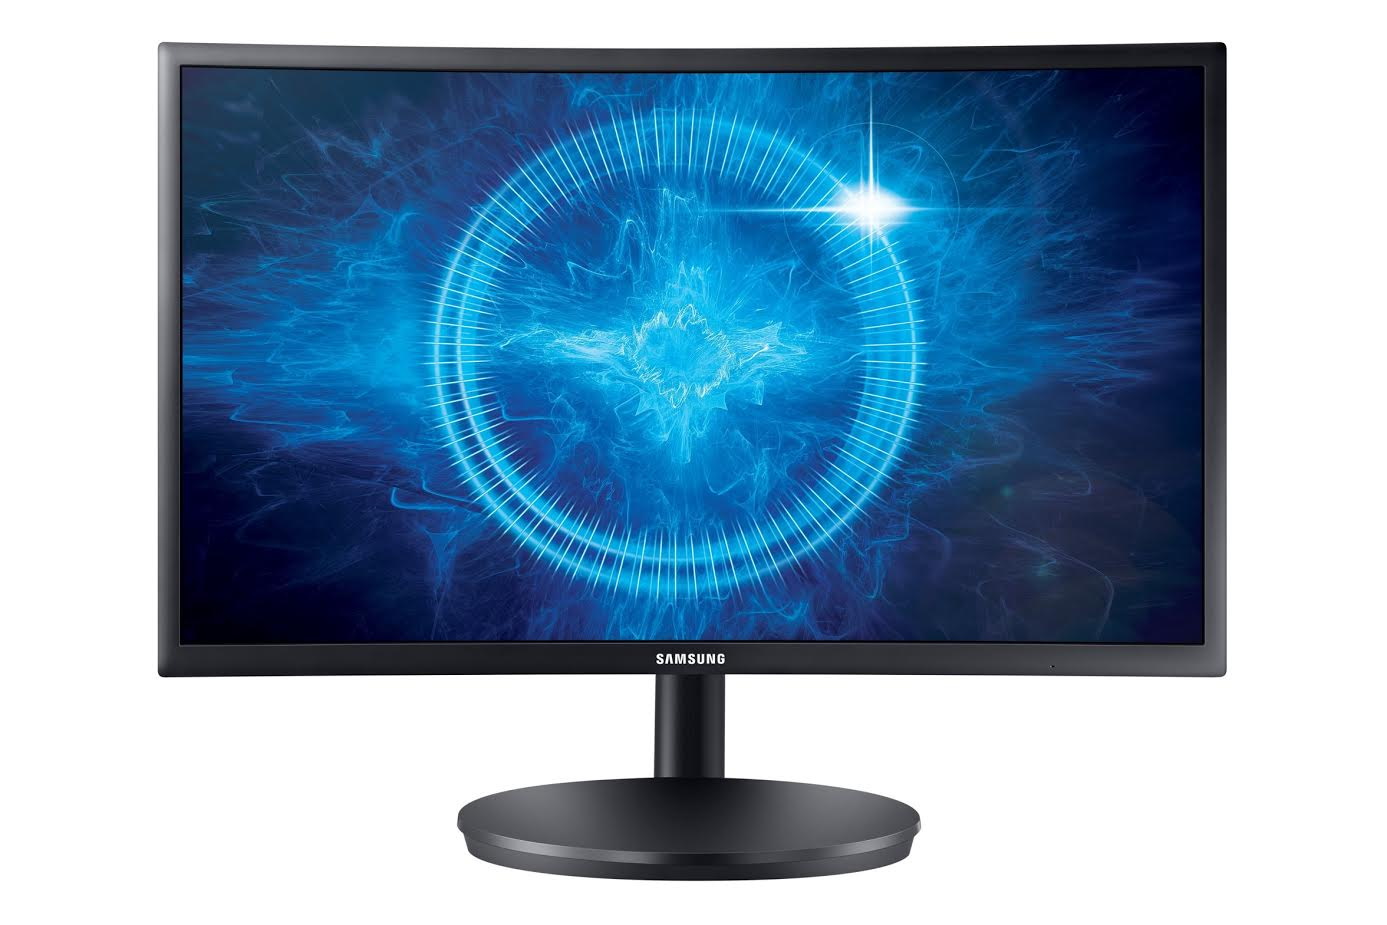 curved Display gaming Monitor Samsung